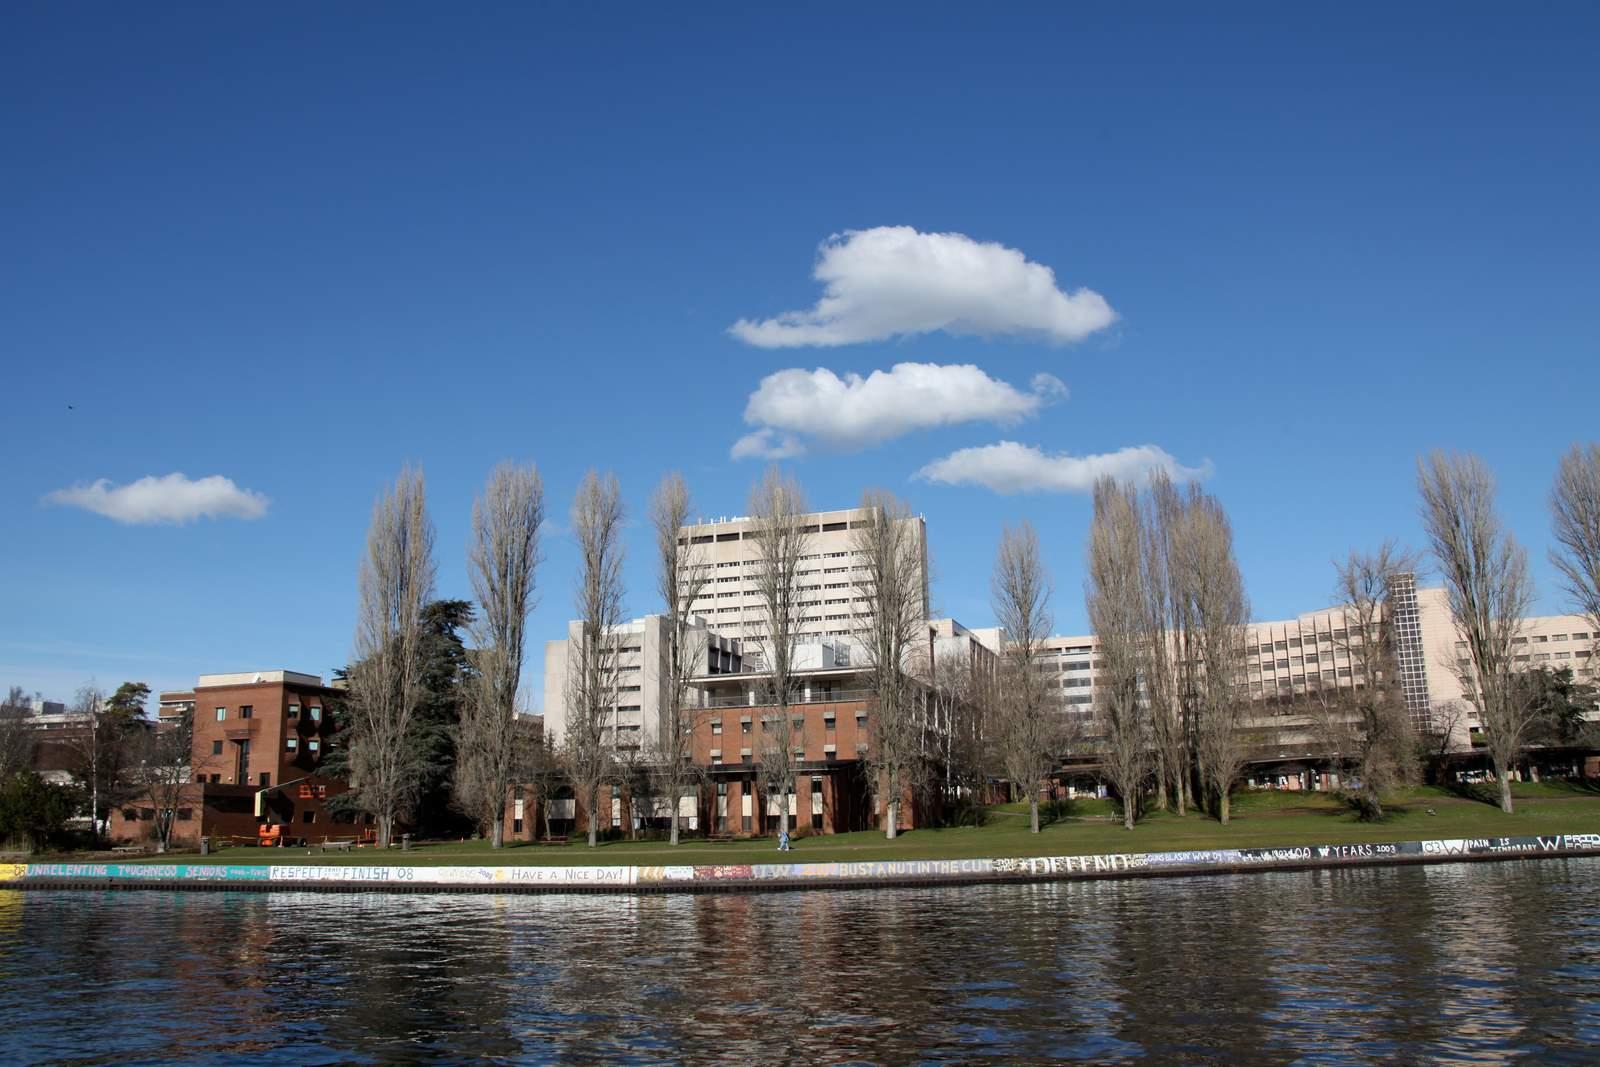 Uw Wallpaper University of washington 1600x1067